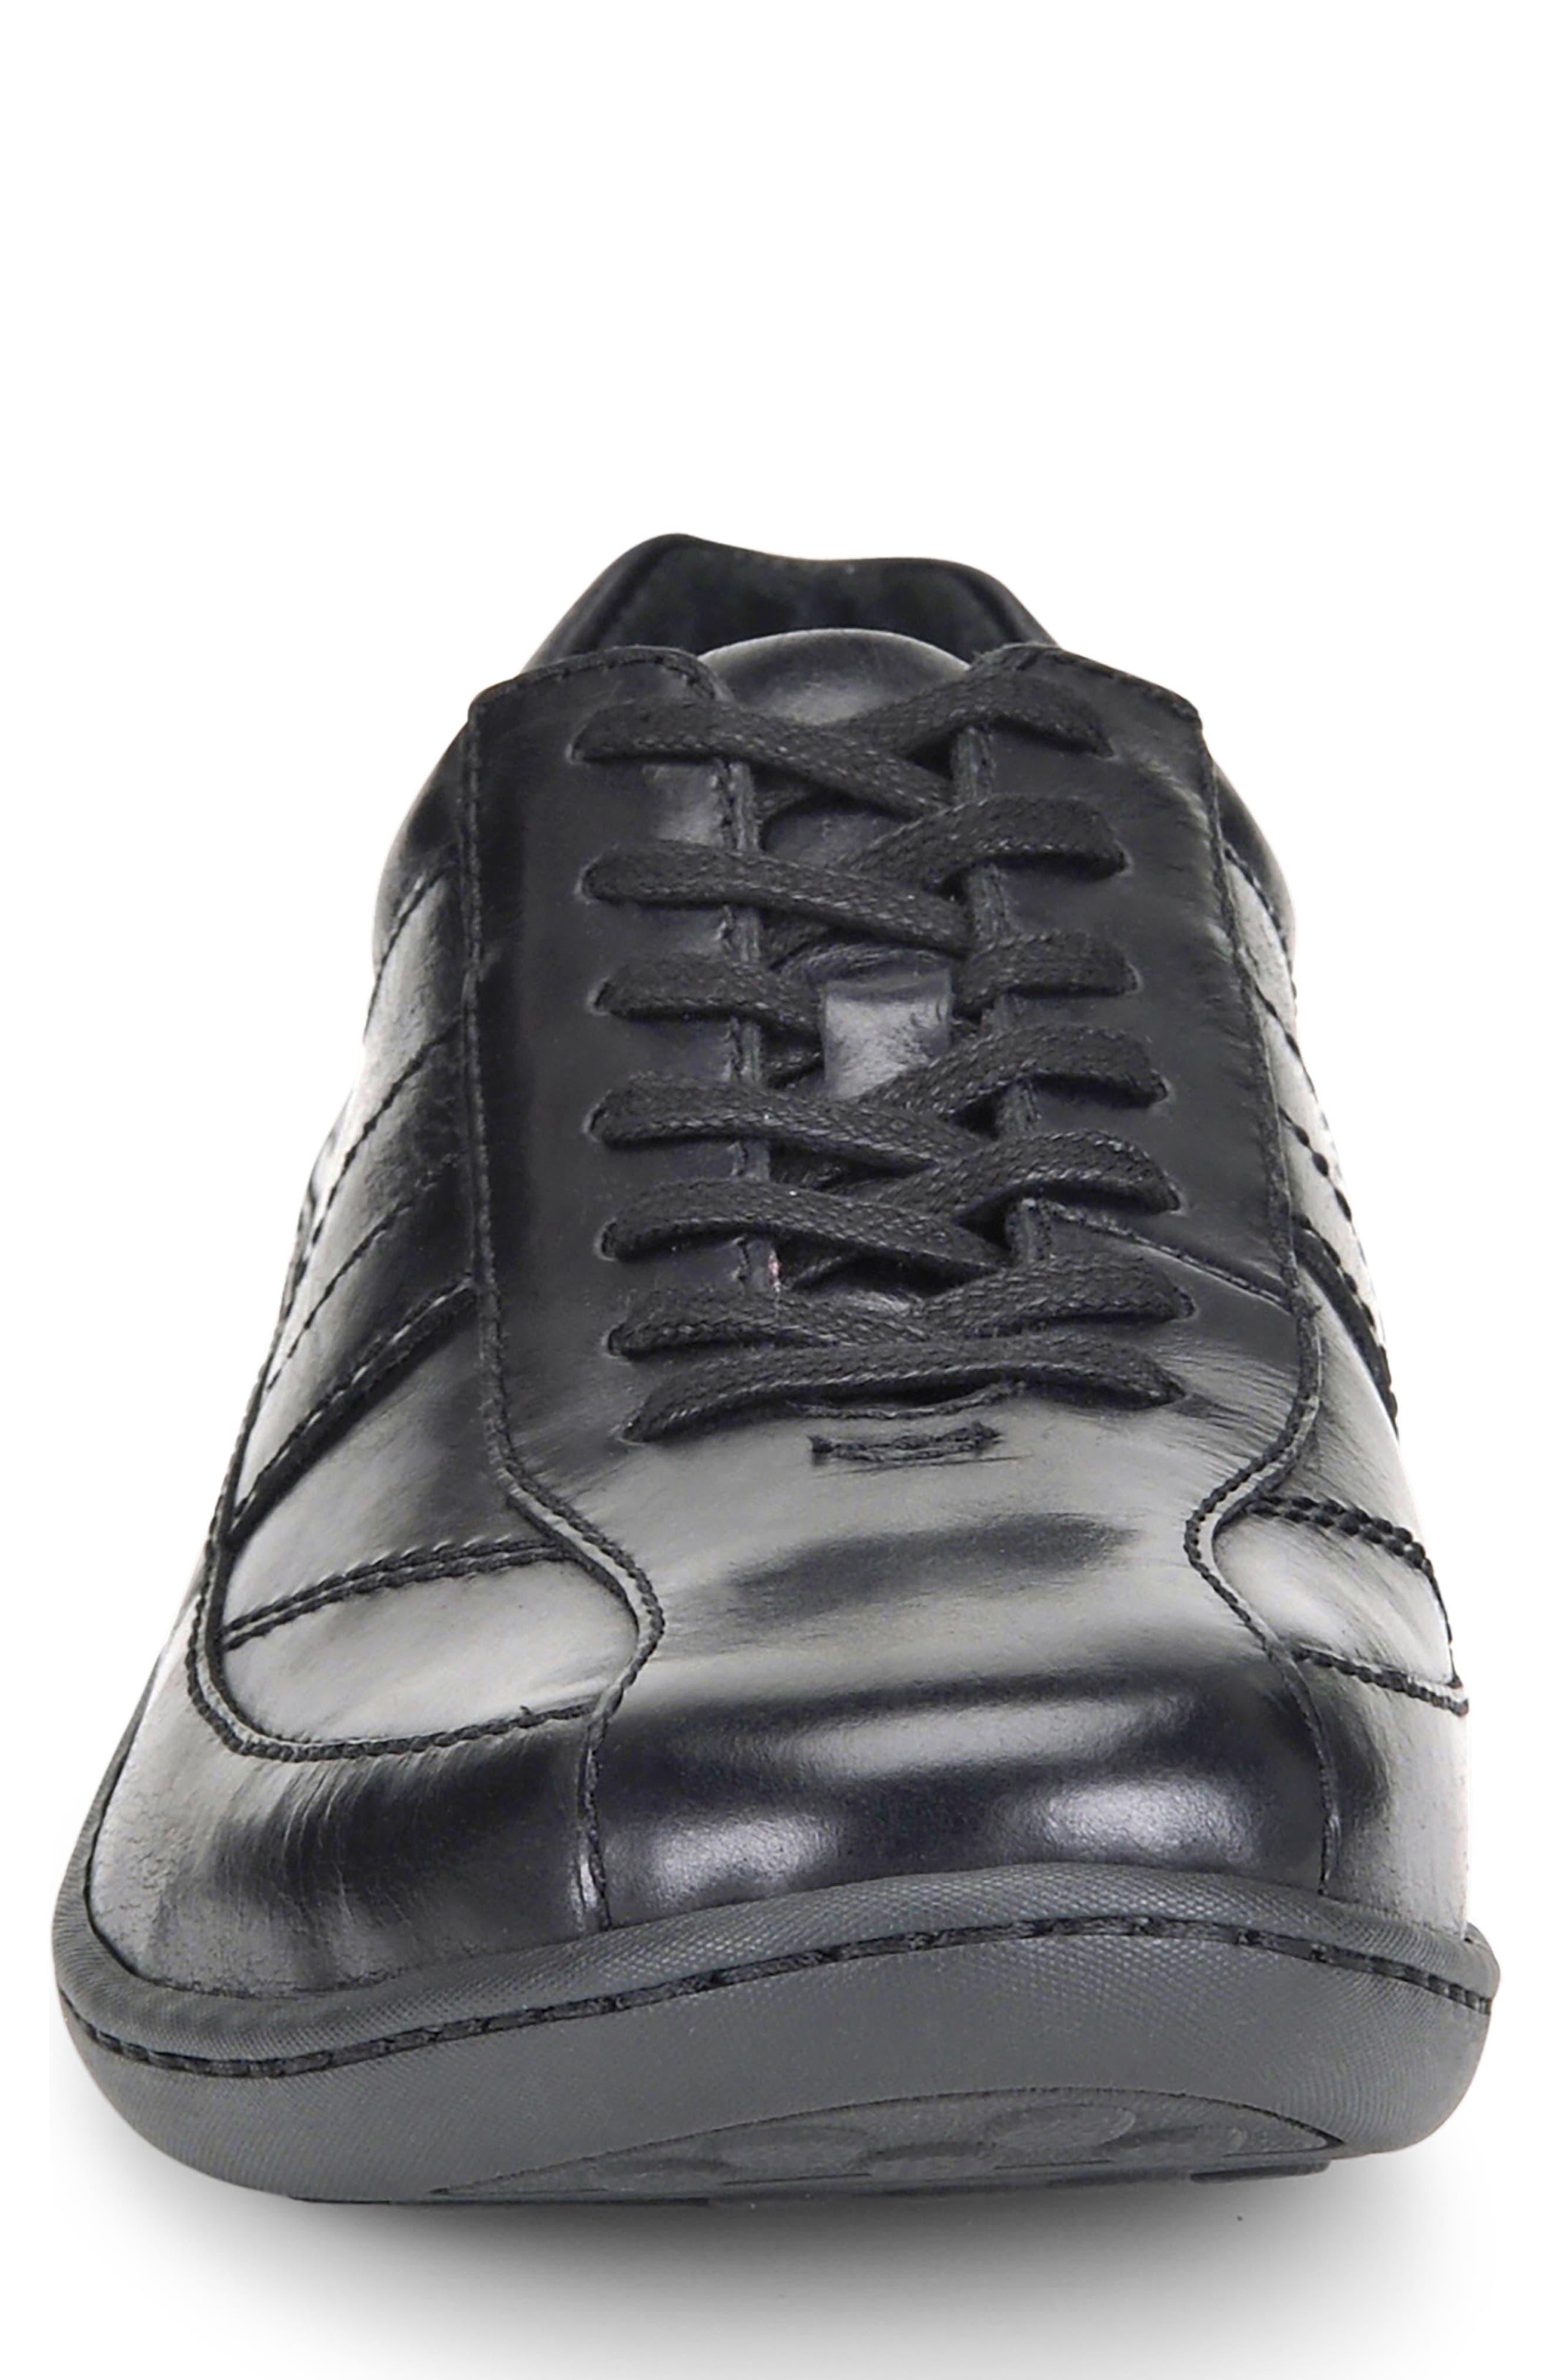 Breves Low Top Sneaker,                             Alternate thumbnail 4, color,                             Black